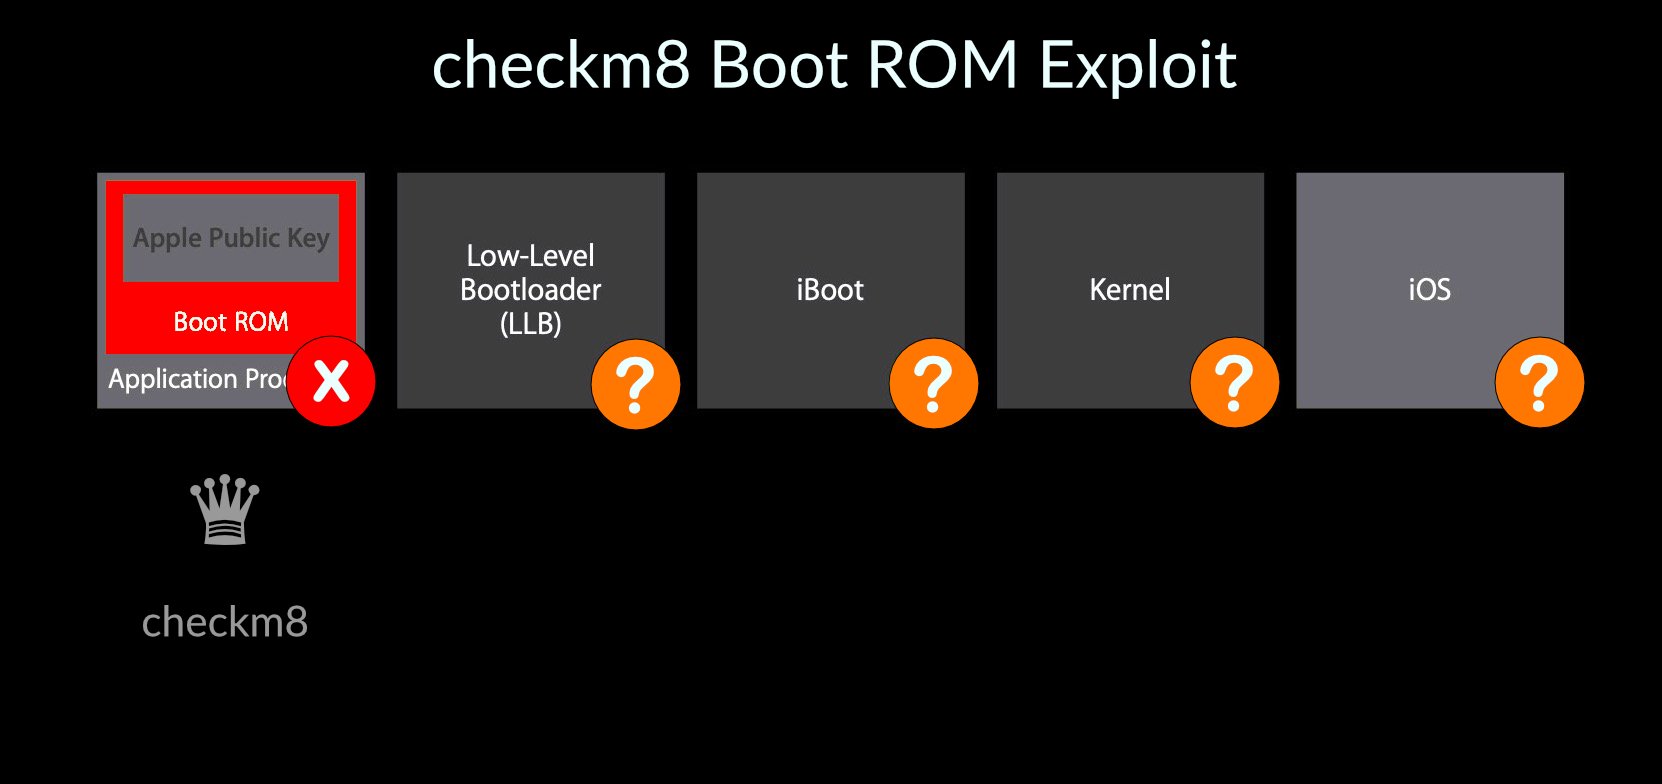 image of checkm8 boot rom exploit